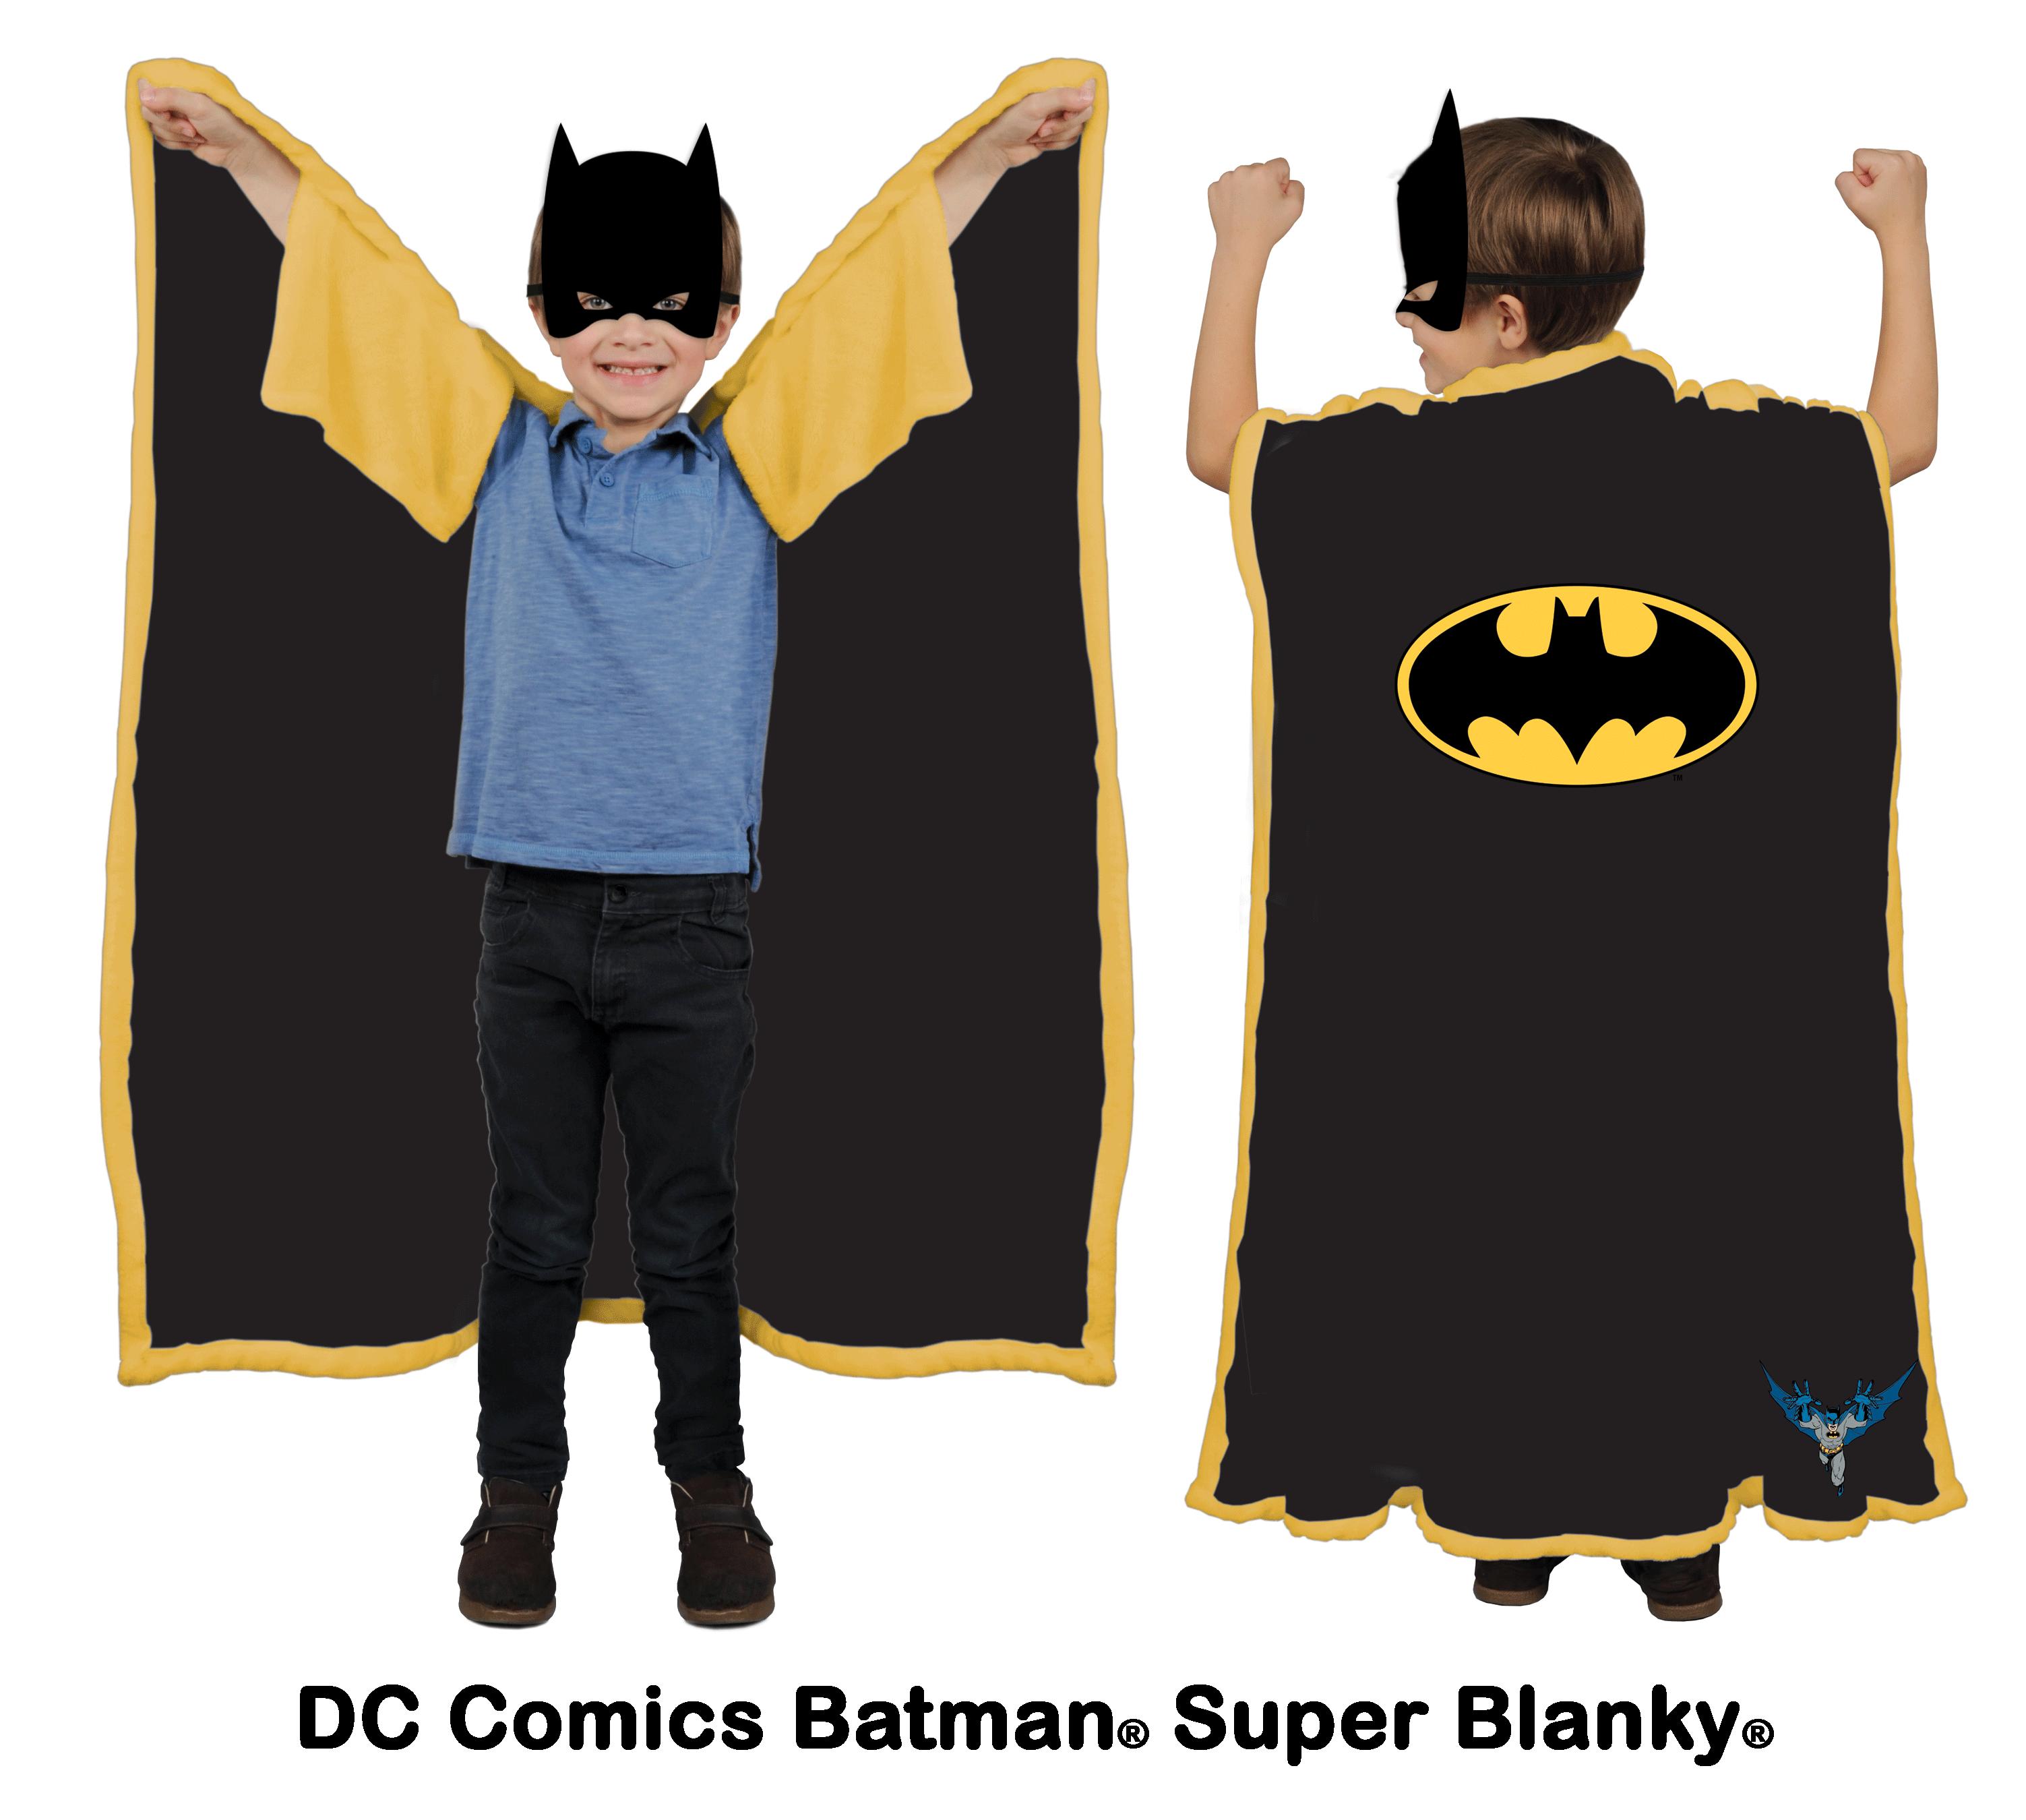 Super Blanky